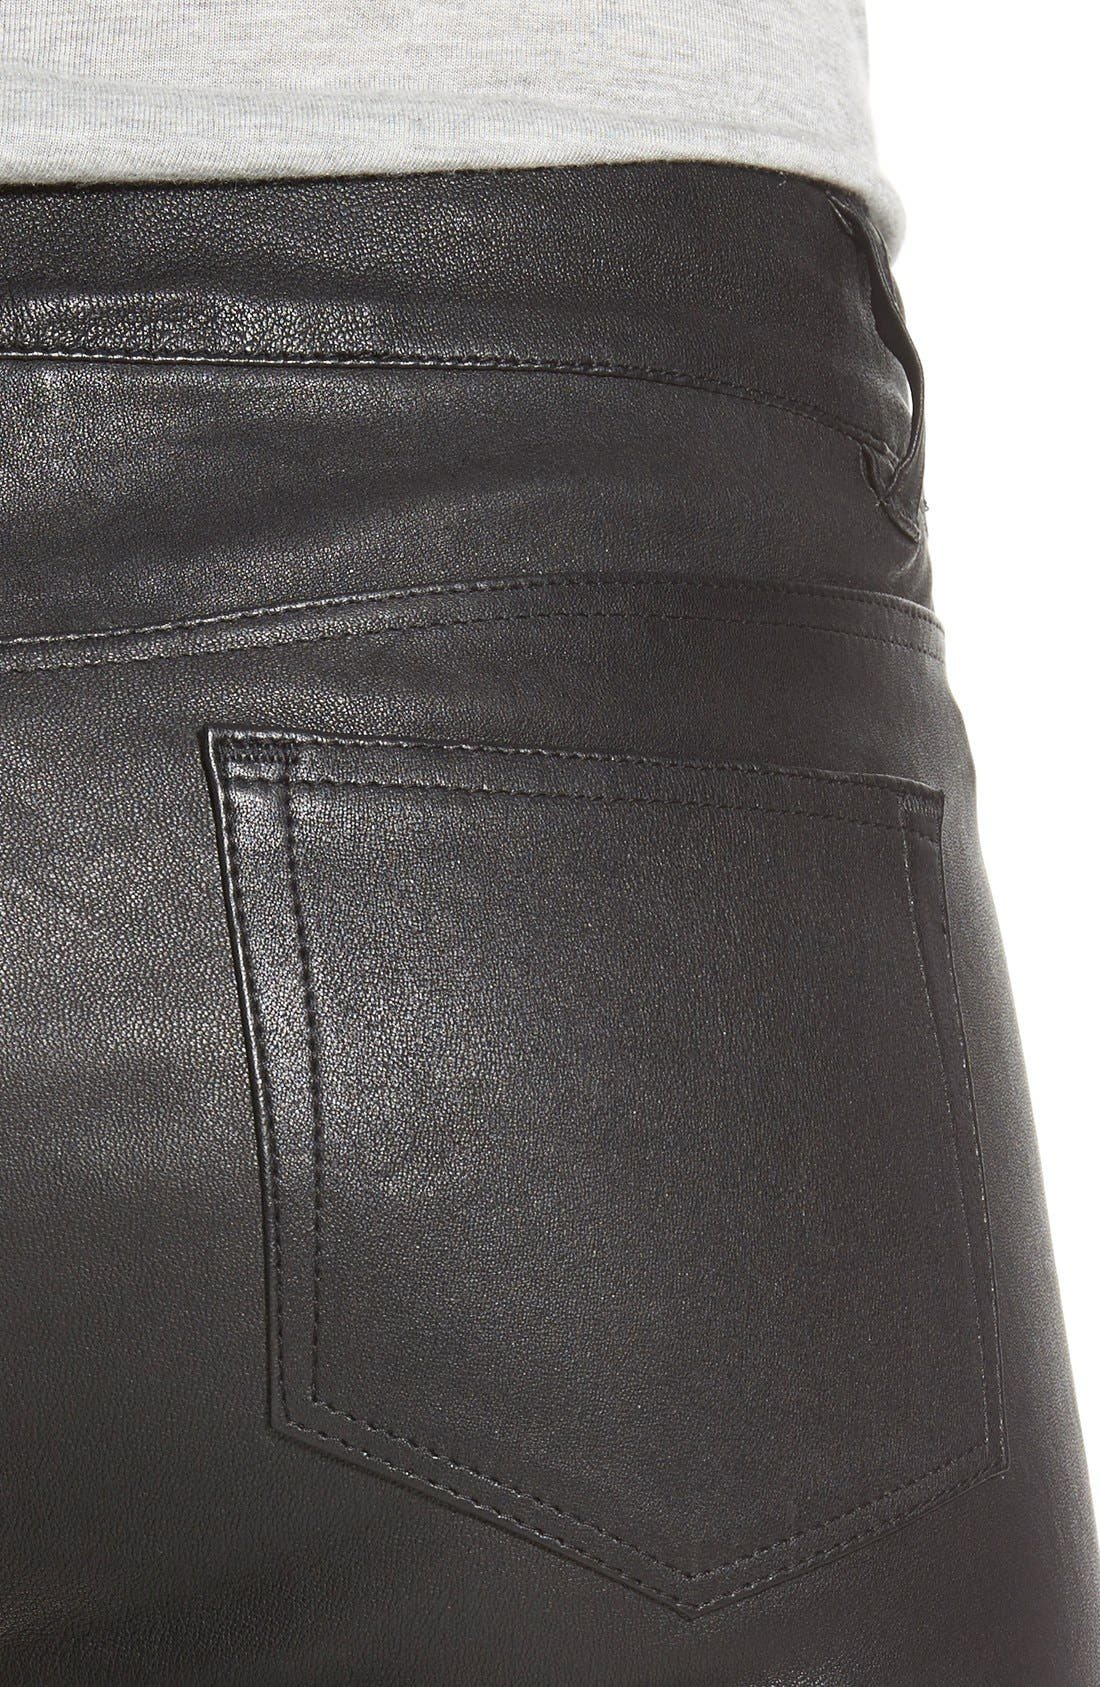 Alternate Image 4  - Paige Denim 'Verdugo' Leather Pants